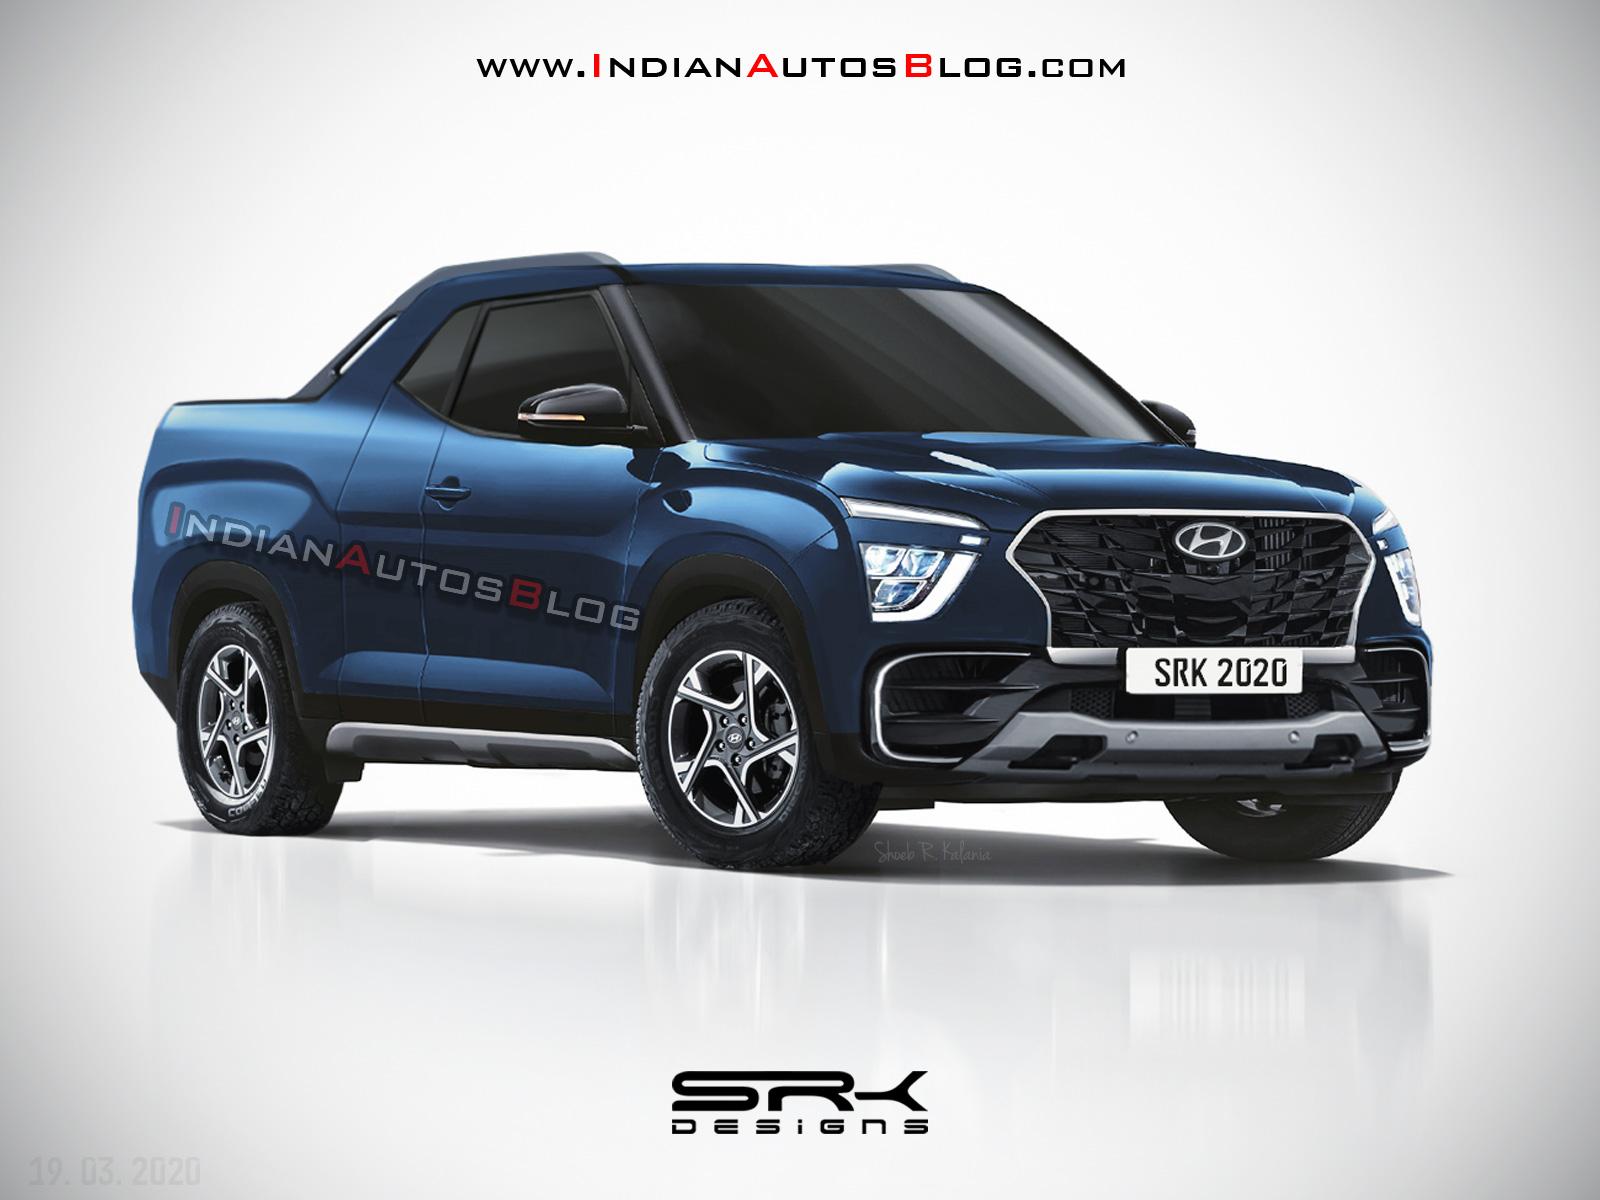 2016 - [Hyundai] Creta STC Concept (Sao Paulo Motor Show) 2021-hyundai-creta-pickup-hyundai-creta-stc-render-9a64